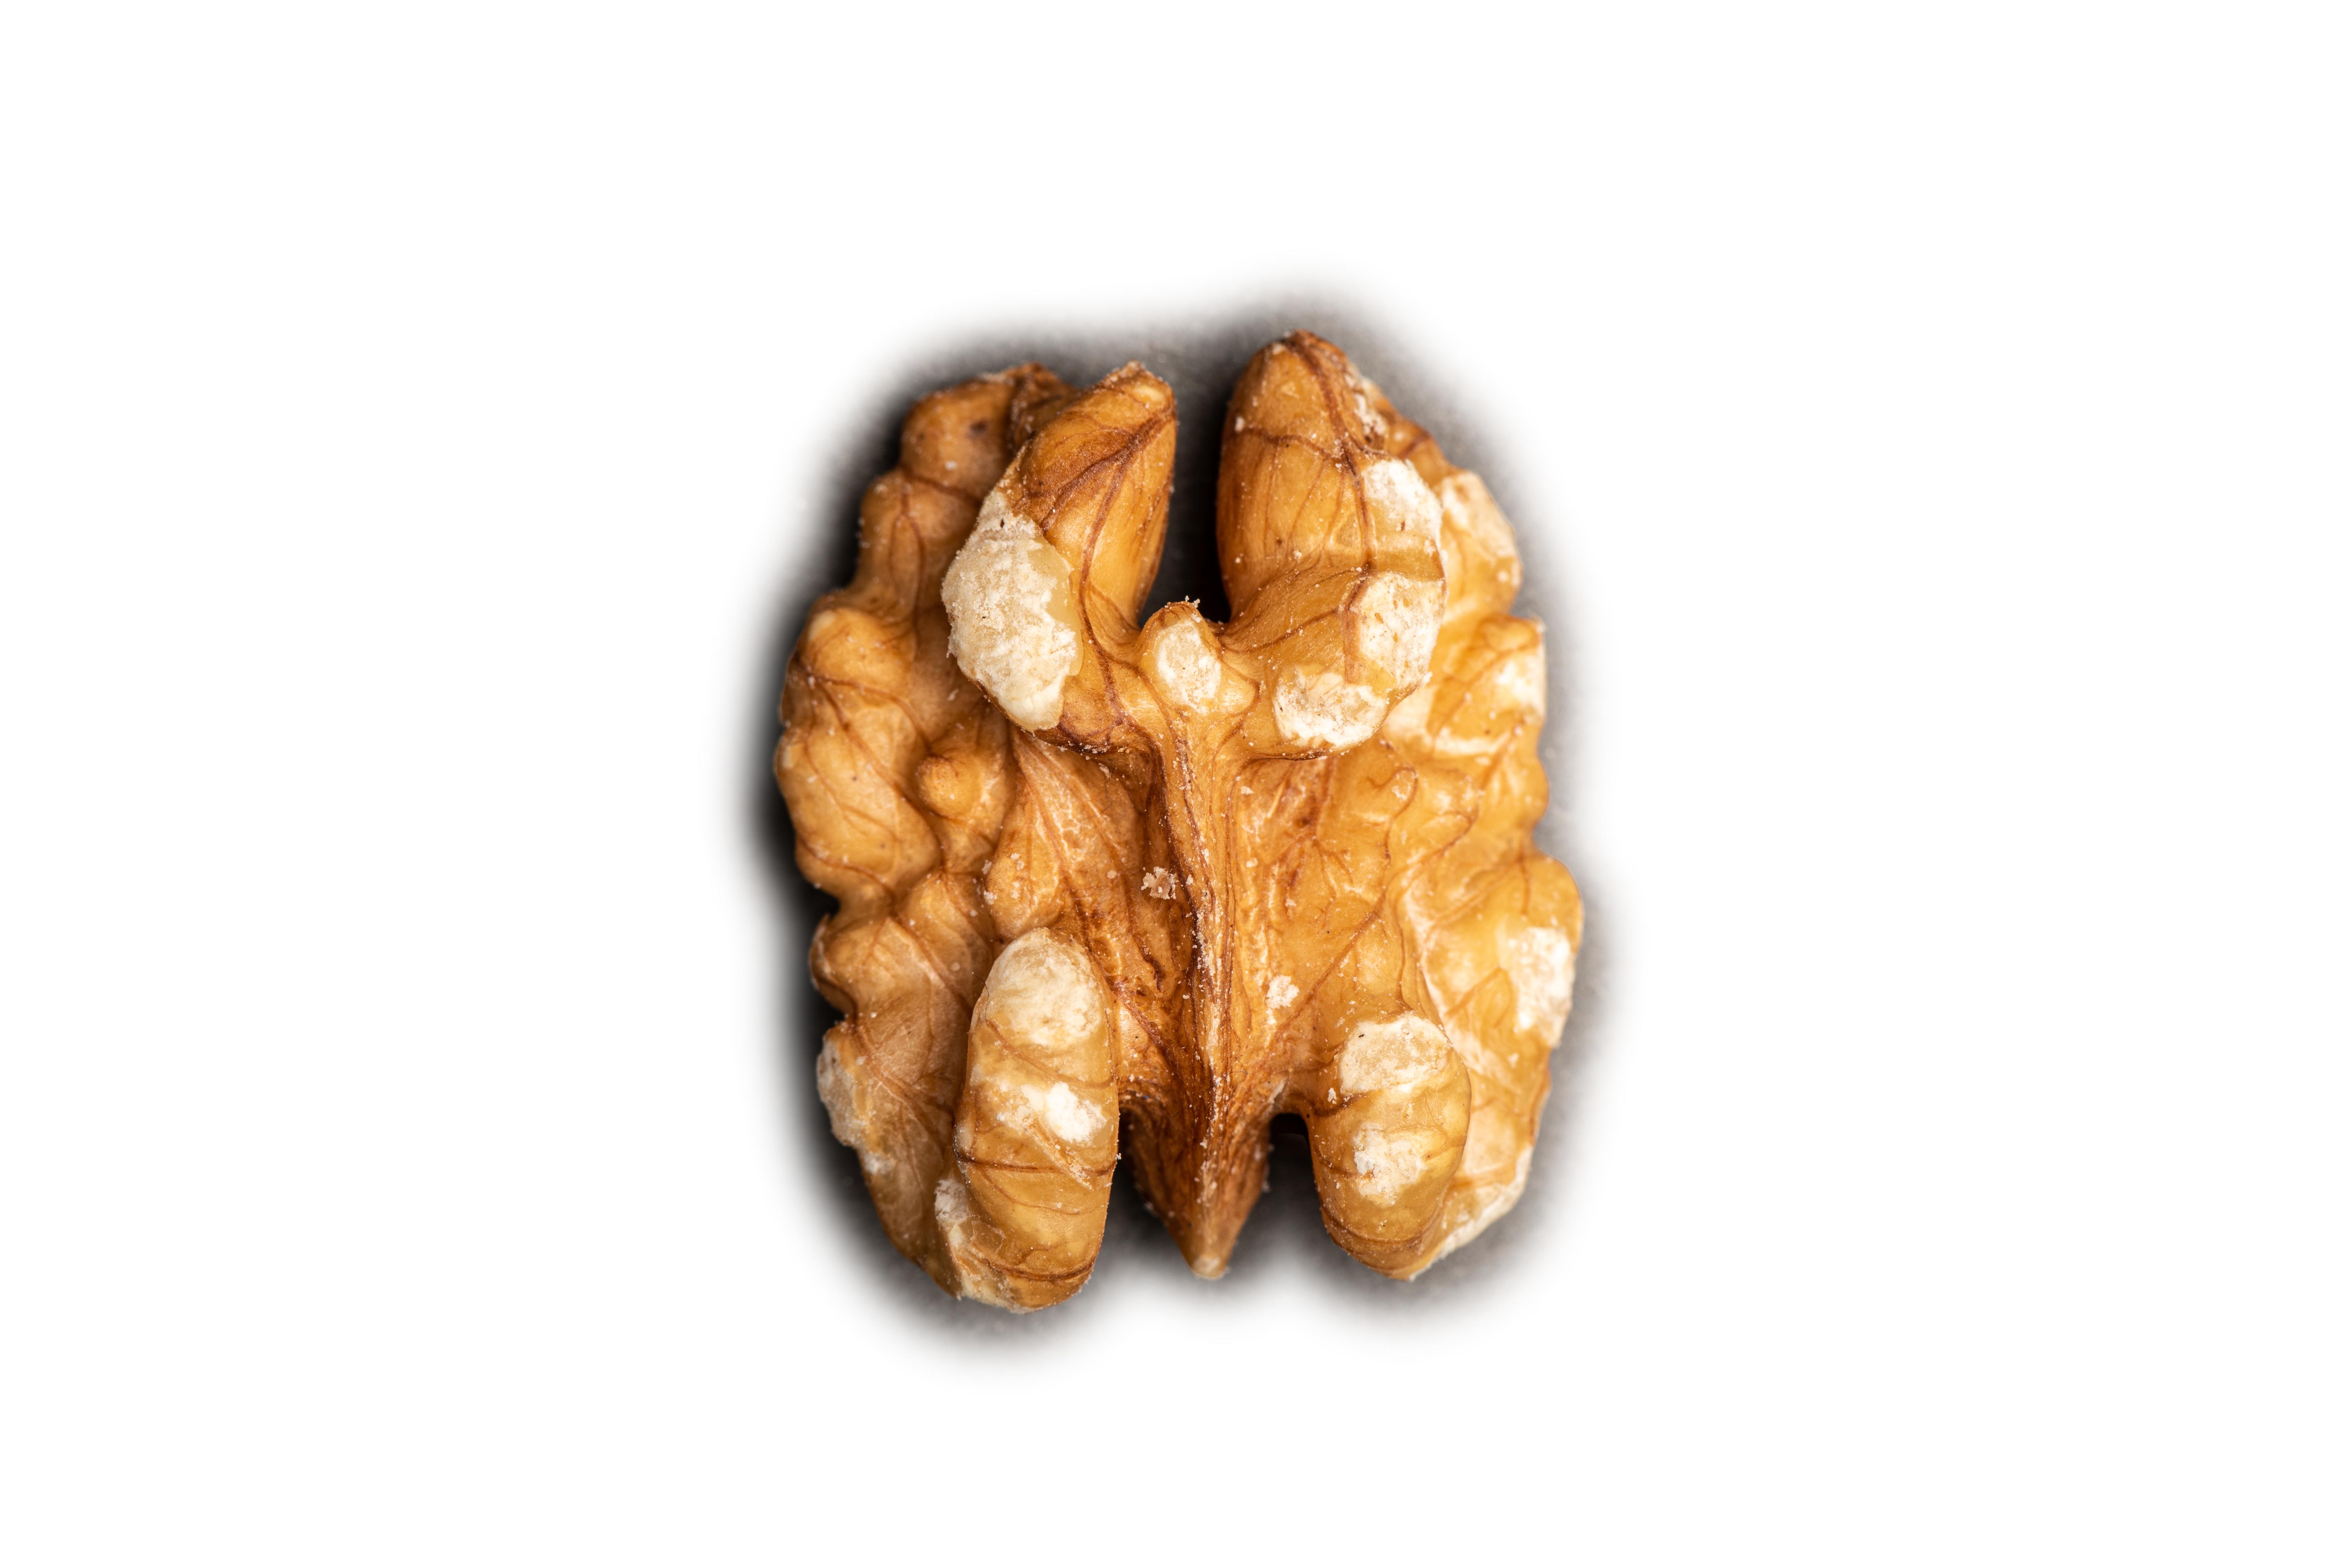 Nut-1